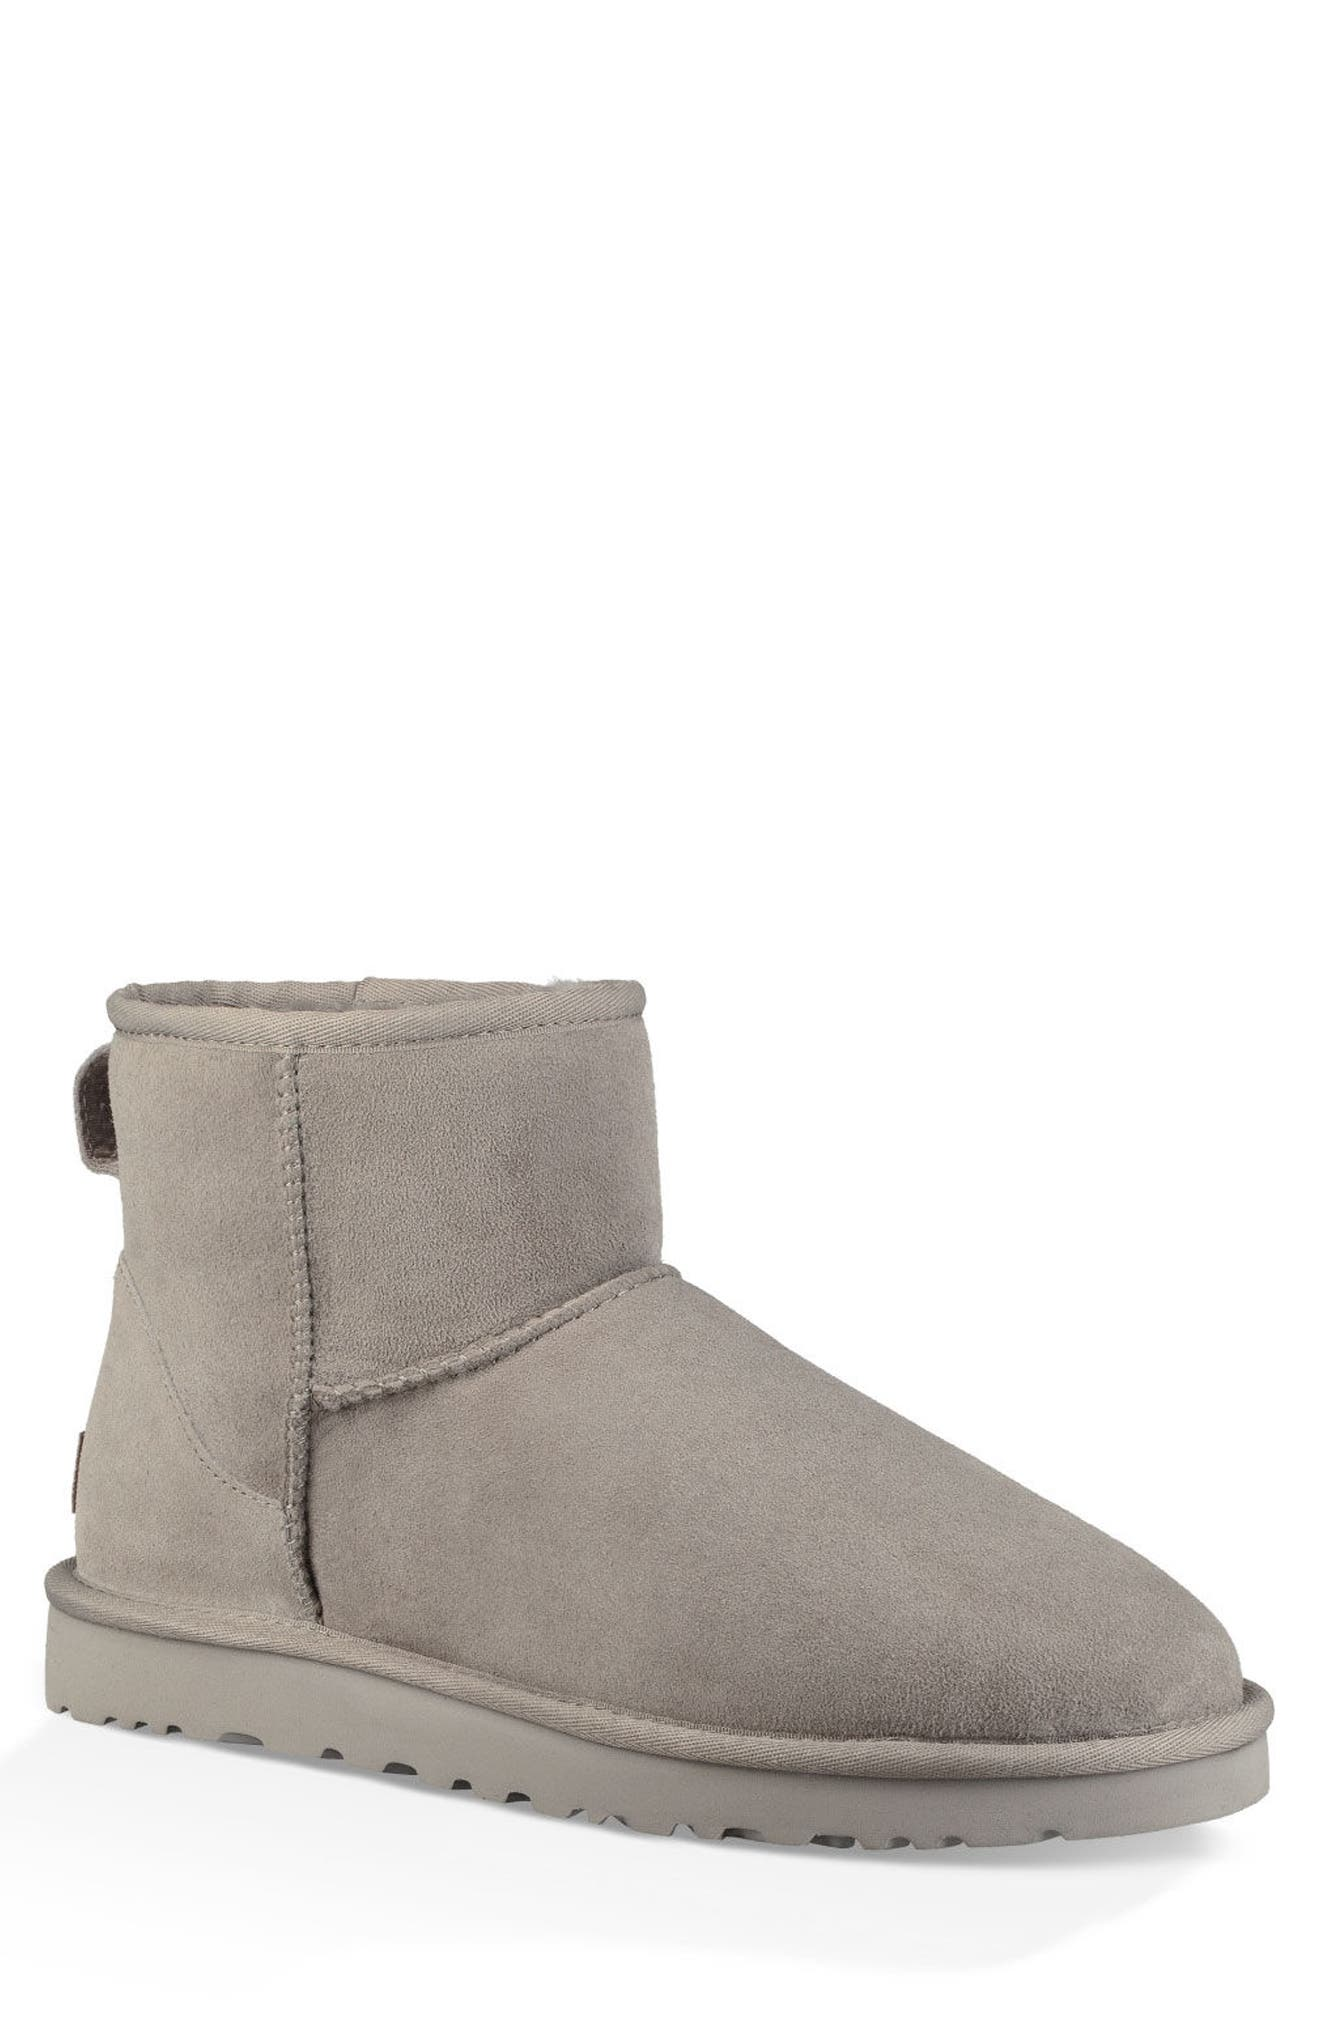 Ugg Classic Mini Boot, Grey